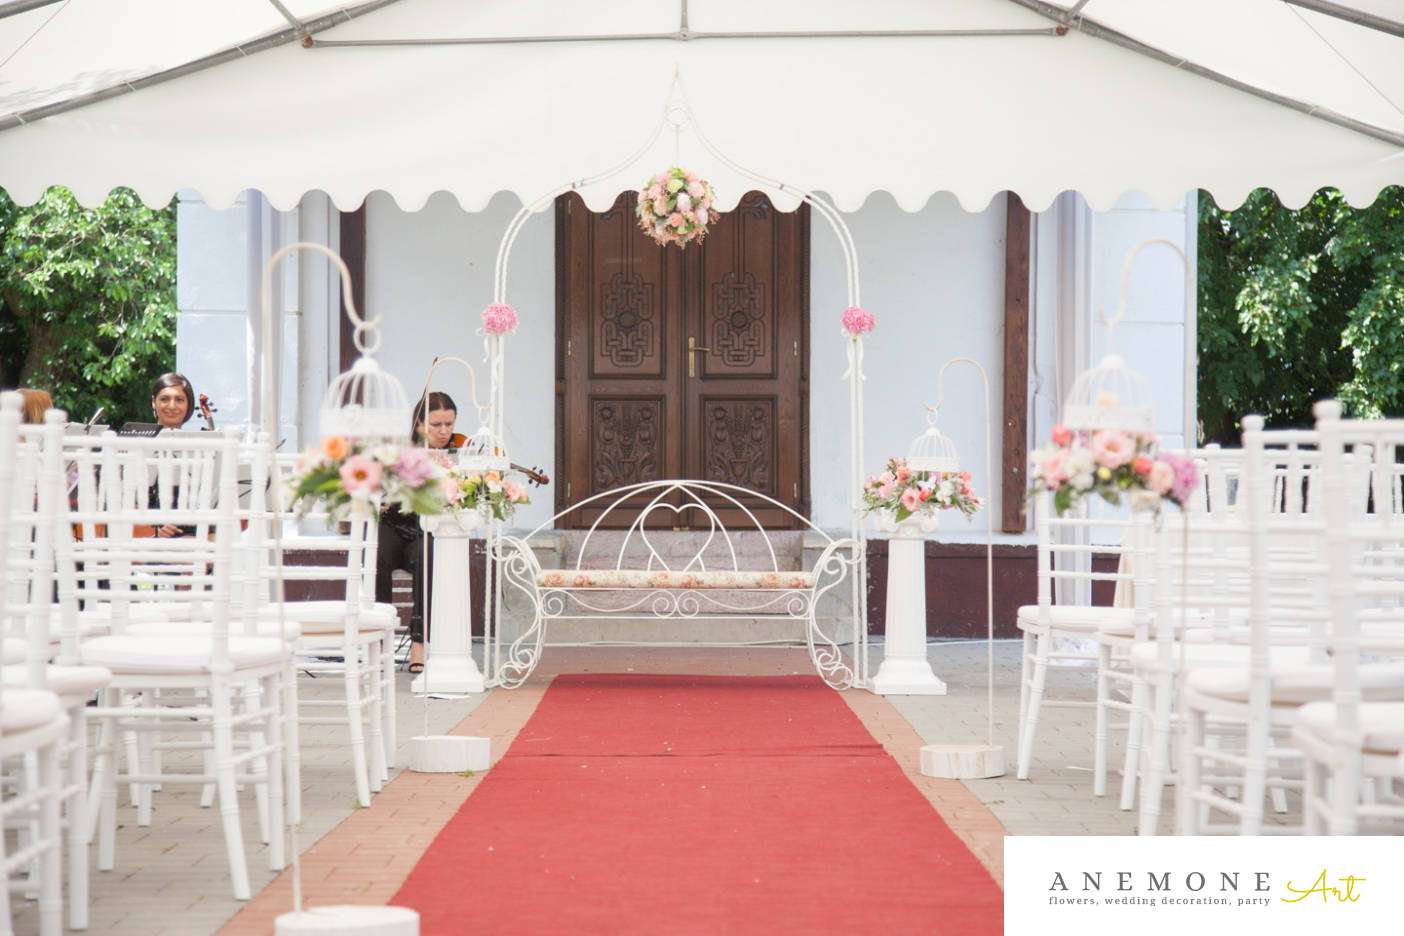 Poza, foto cu Flori de nunta arcada, colivie, decor biserica in Arad, Timisoara, Oradea (wedding flowers, bouquets) nunta Arad, Timisoara, Oradea